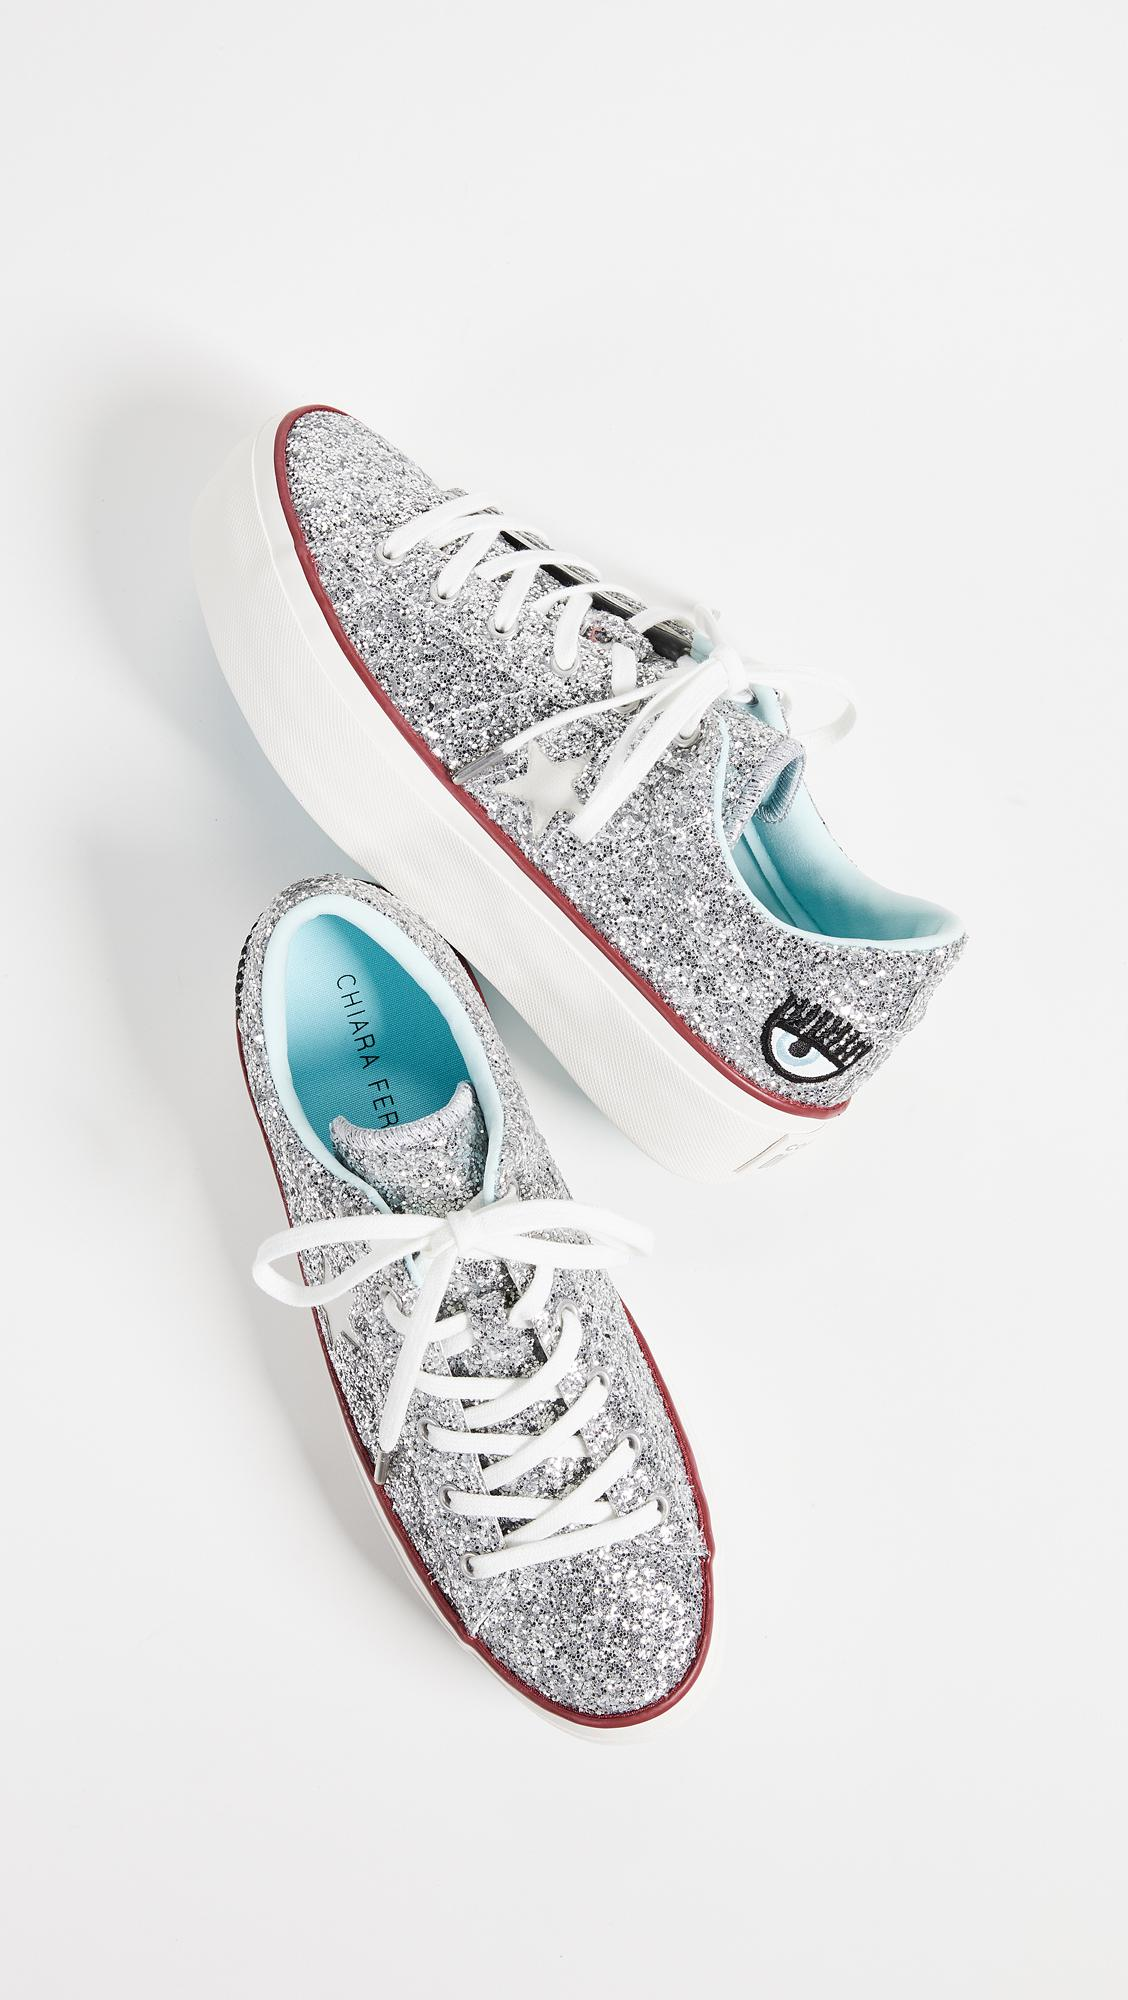 605a83fb4716 Lyst - Converse X Chiara Ferragni Sneakers in Metallic